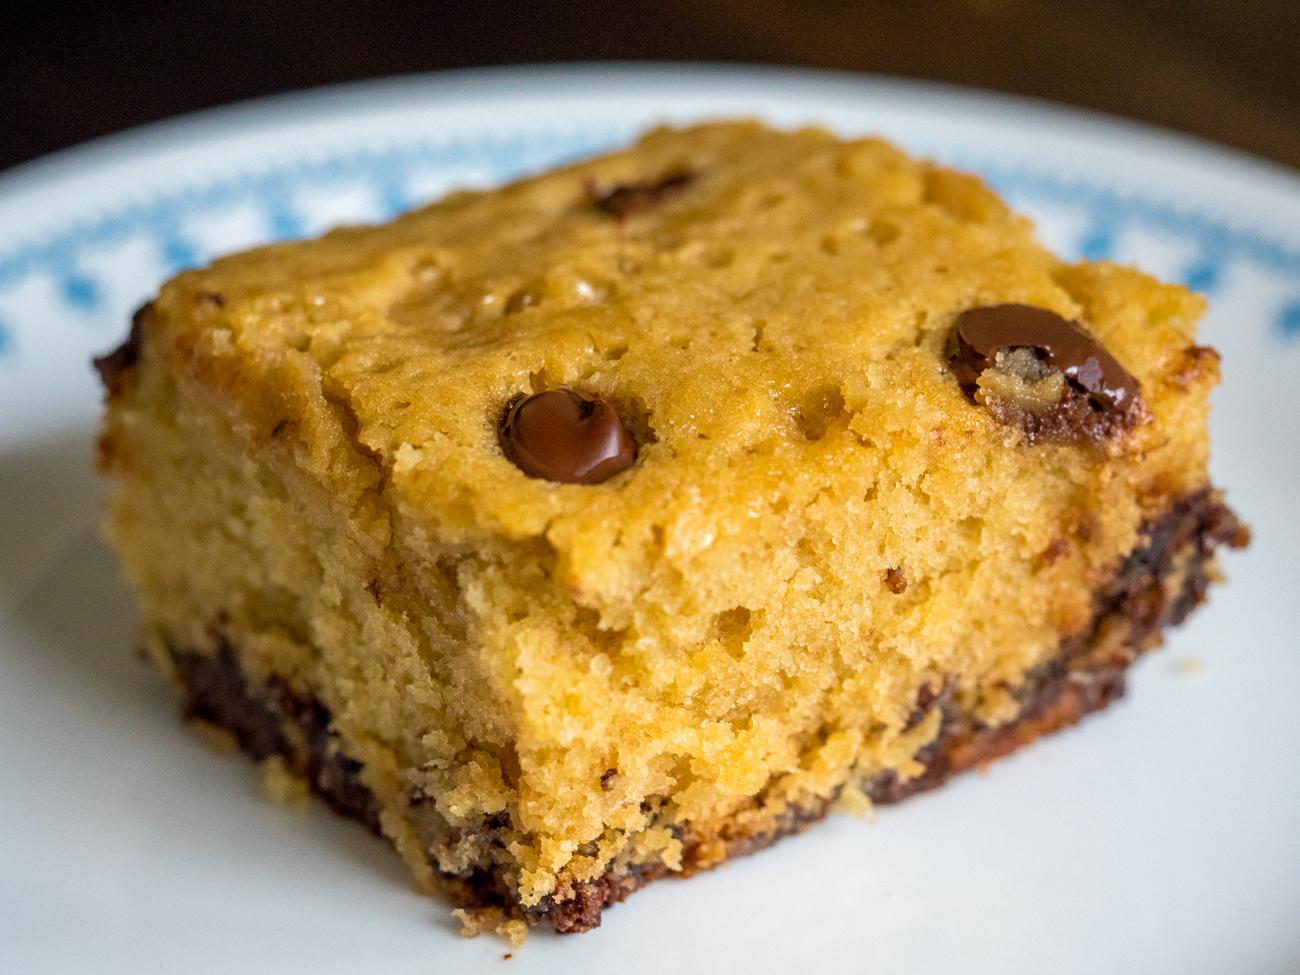 XXL Slow Cooker Cookie Horizontal 4